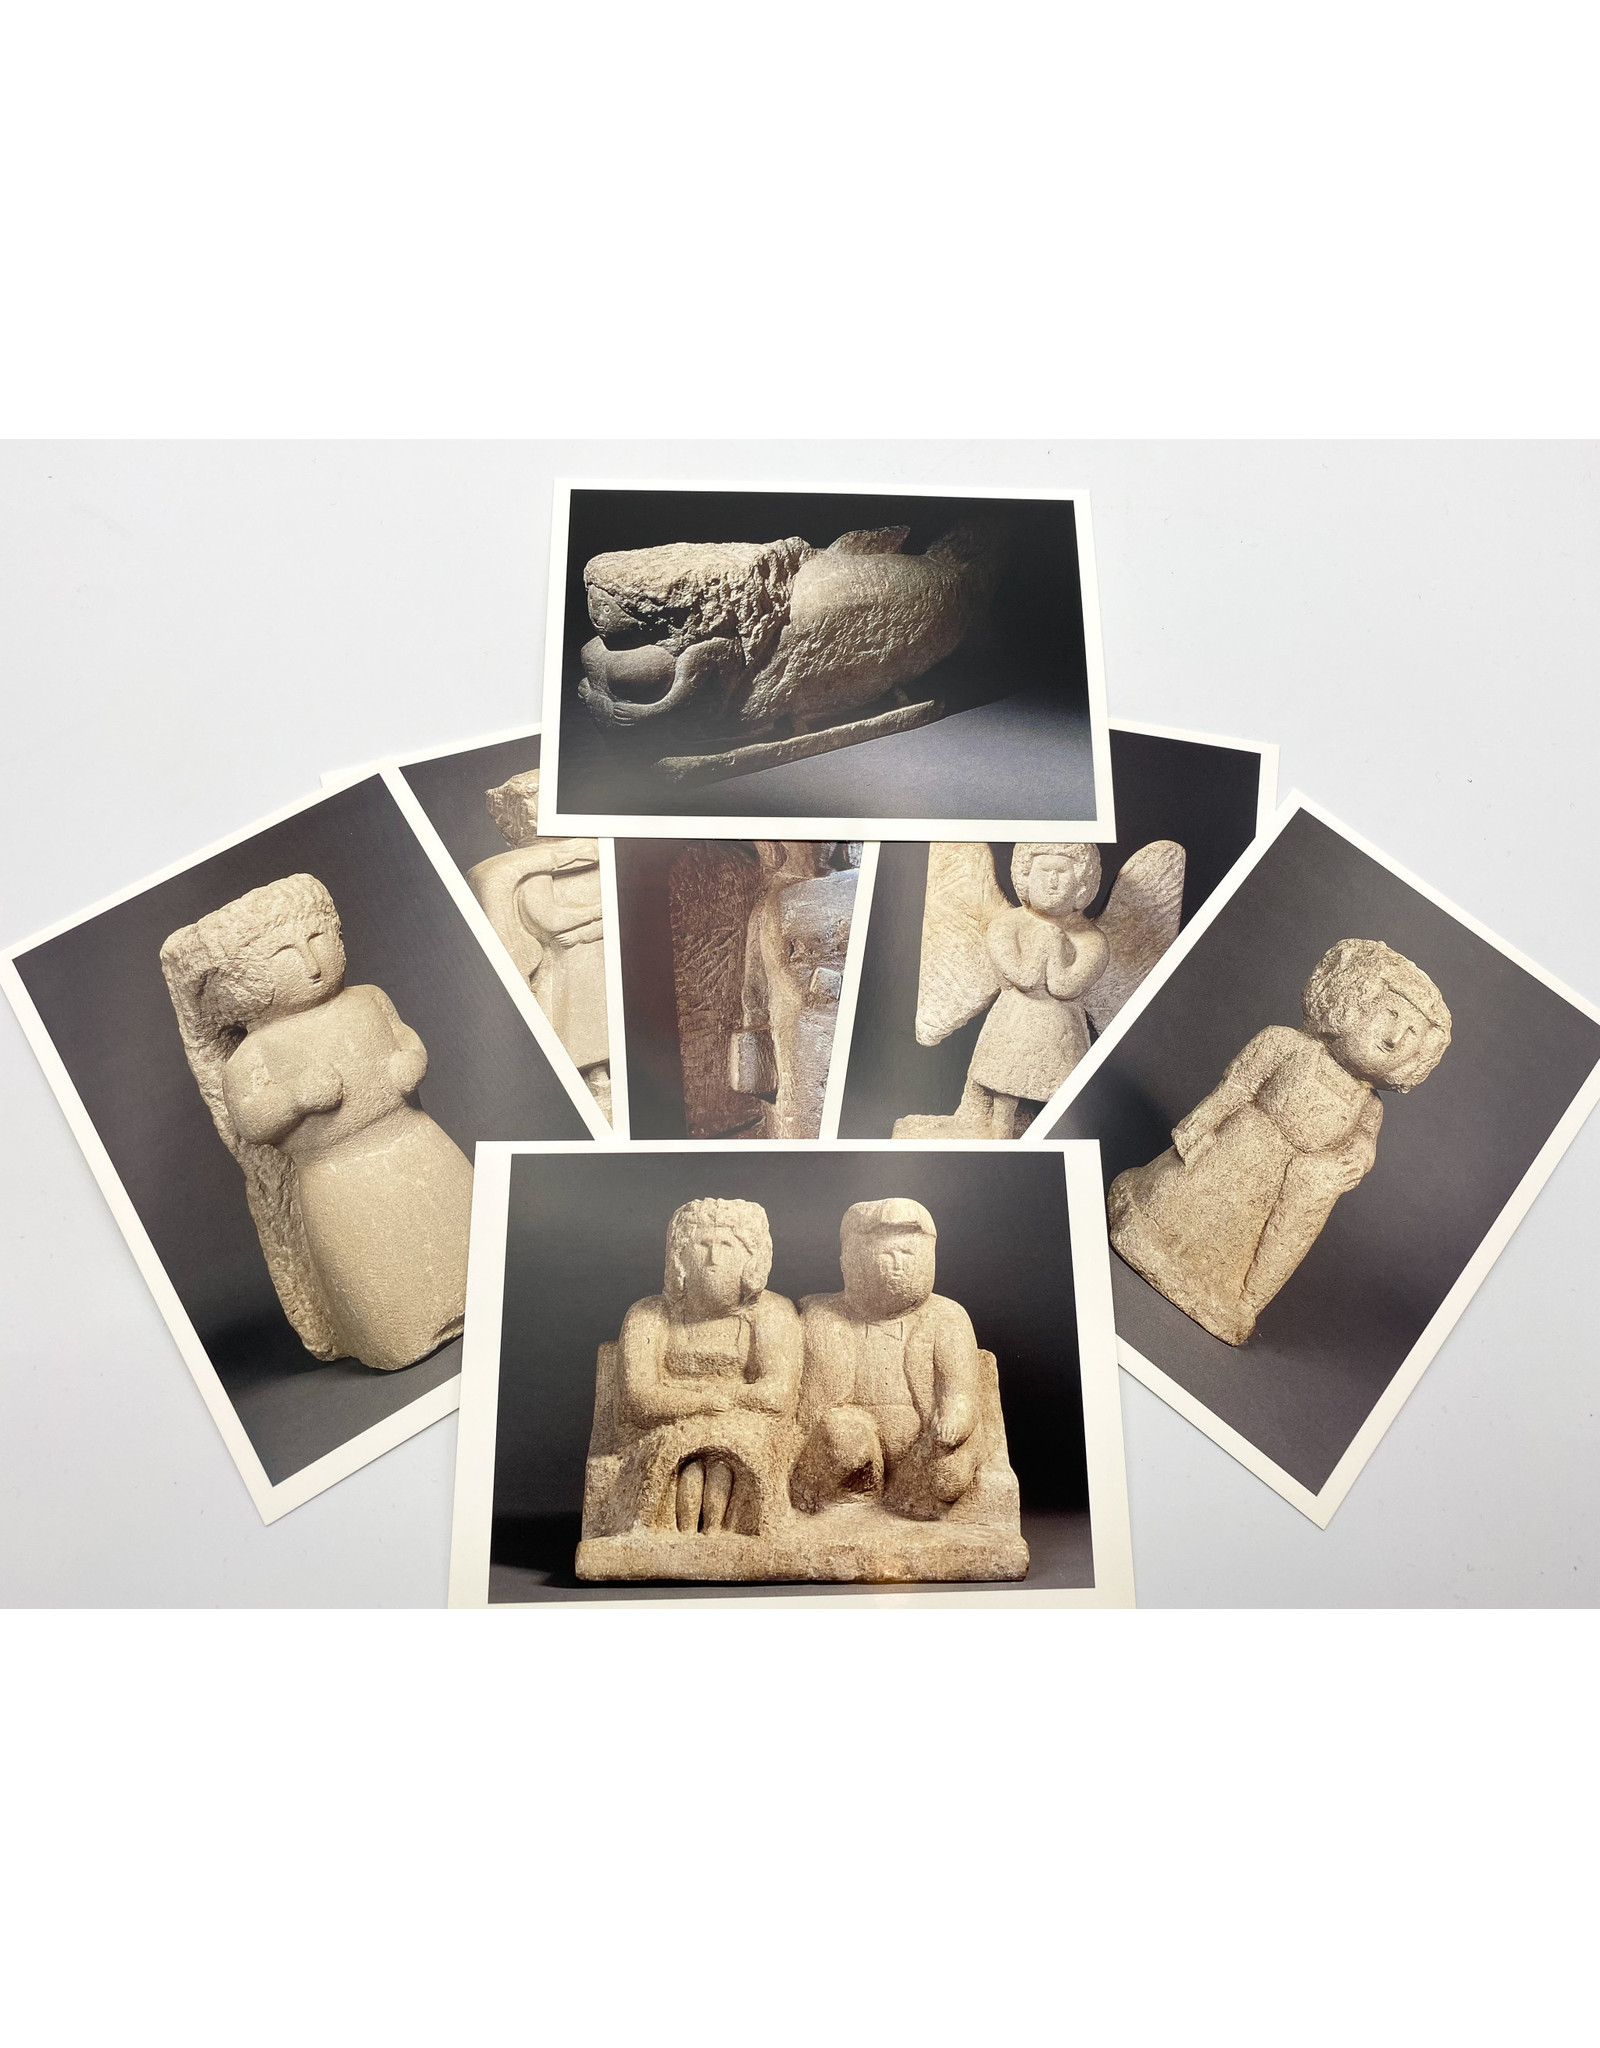 William Edmondson Postcard Set of 7